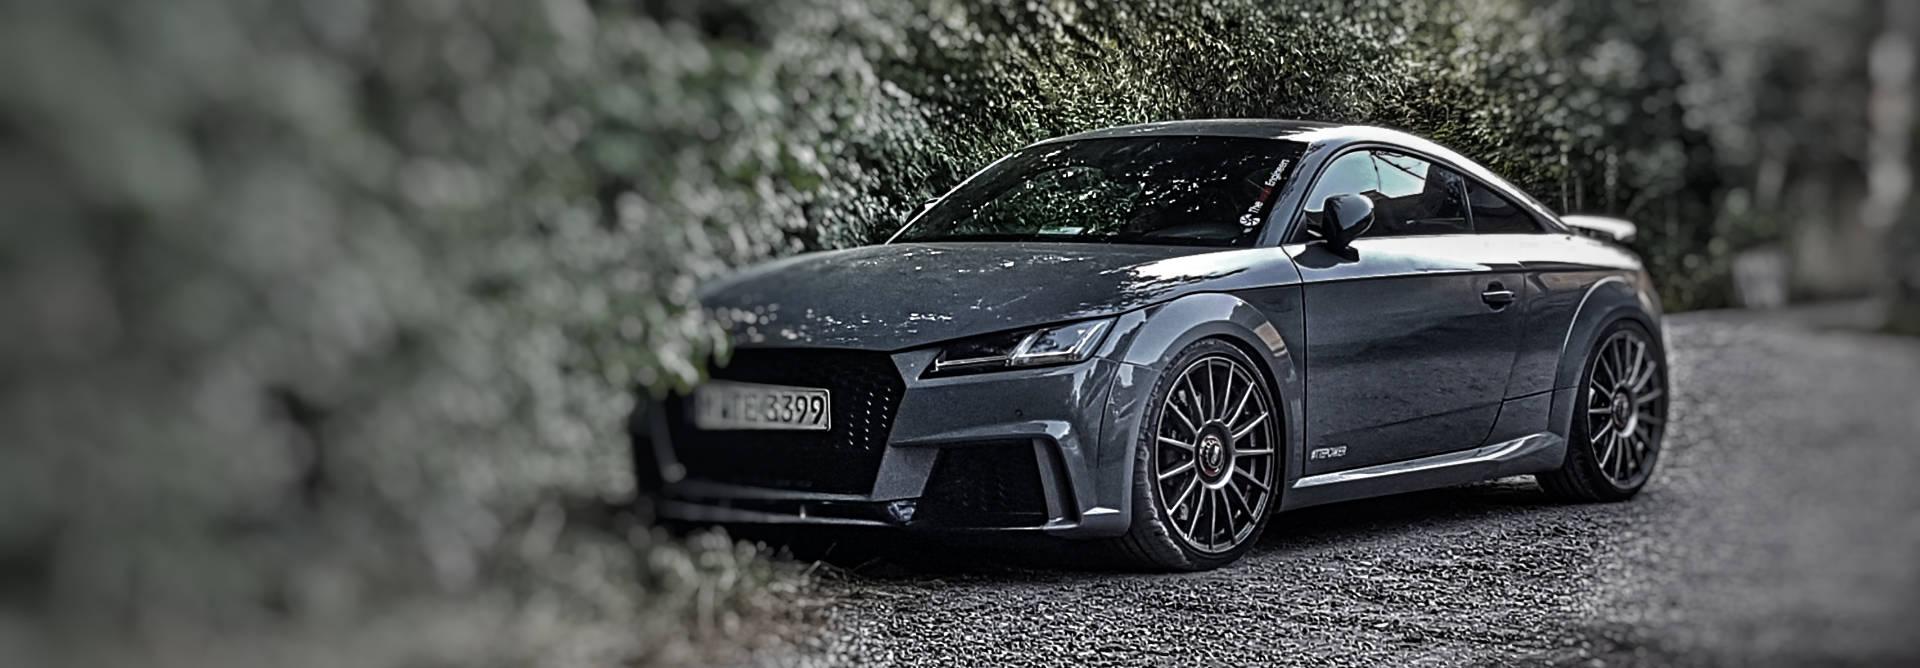 TIJ Audi TTRS S8